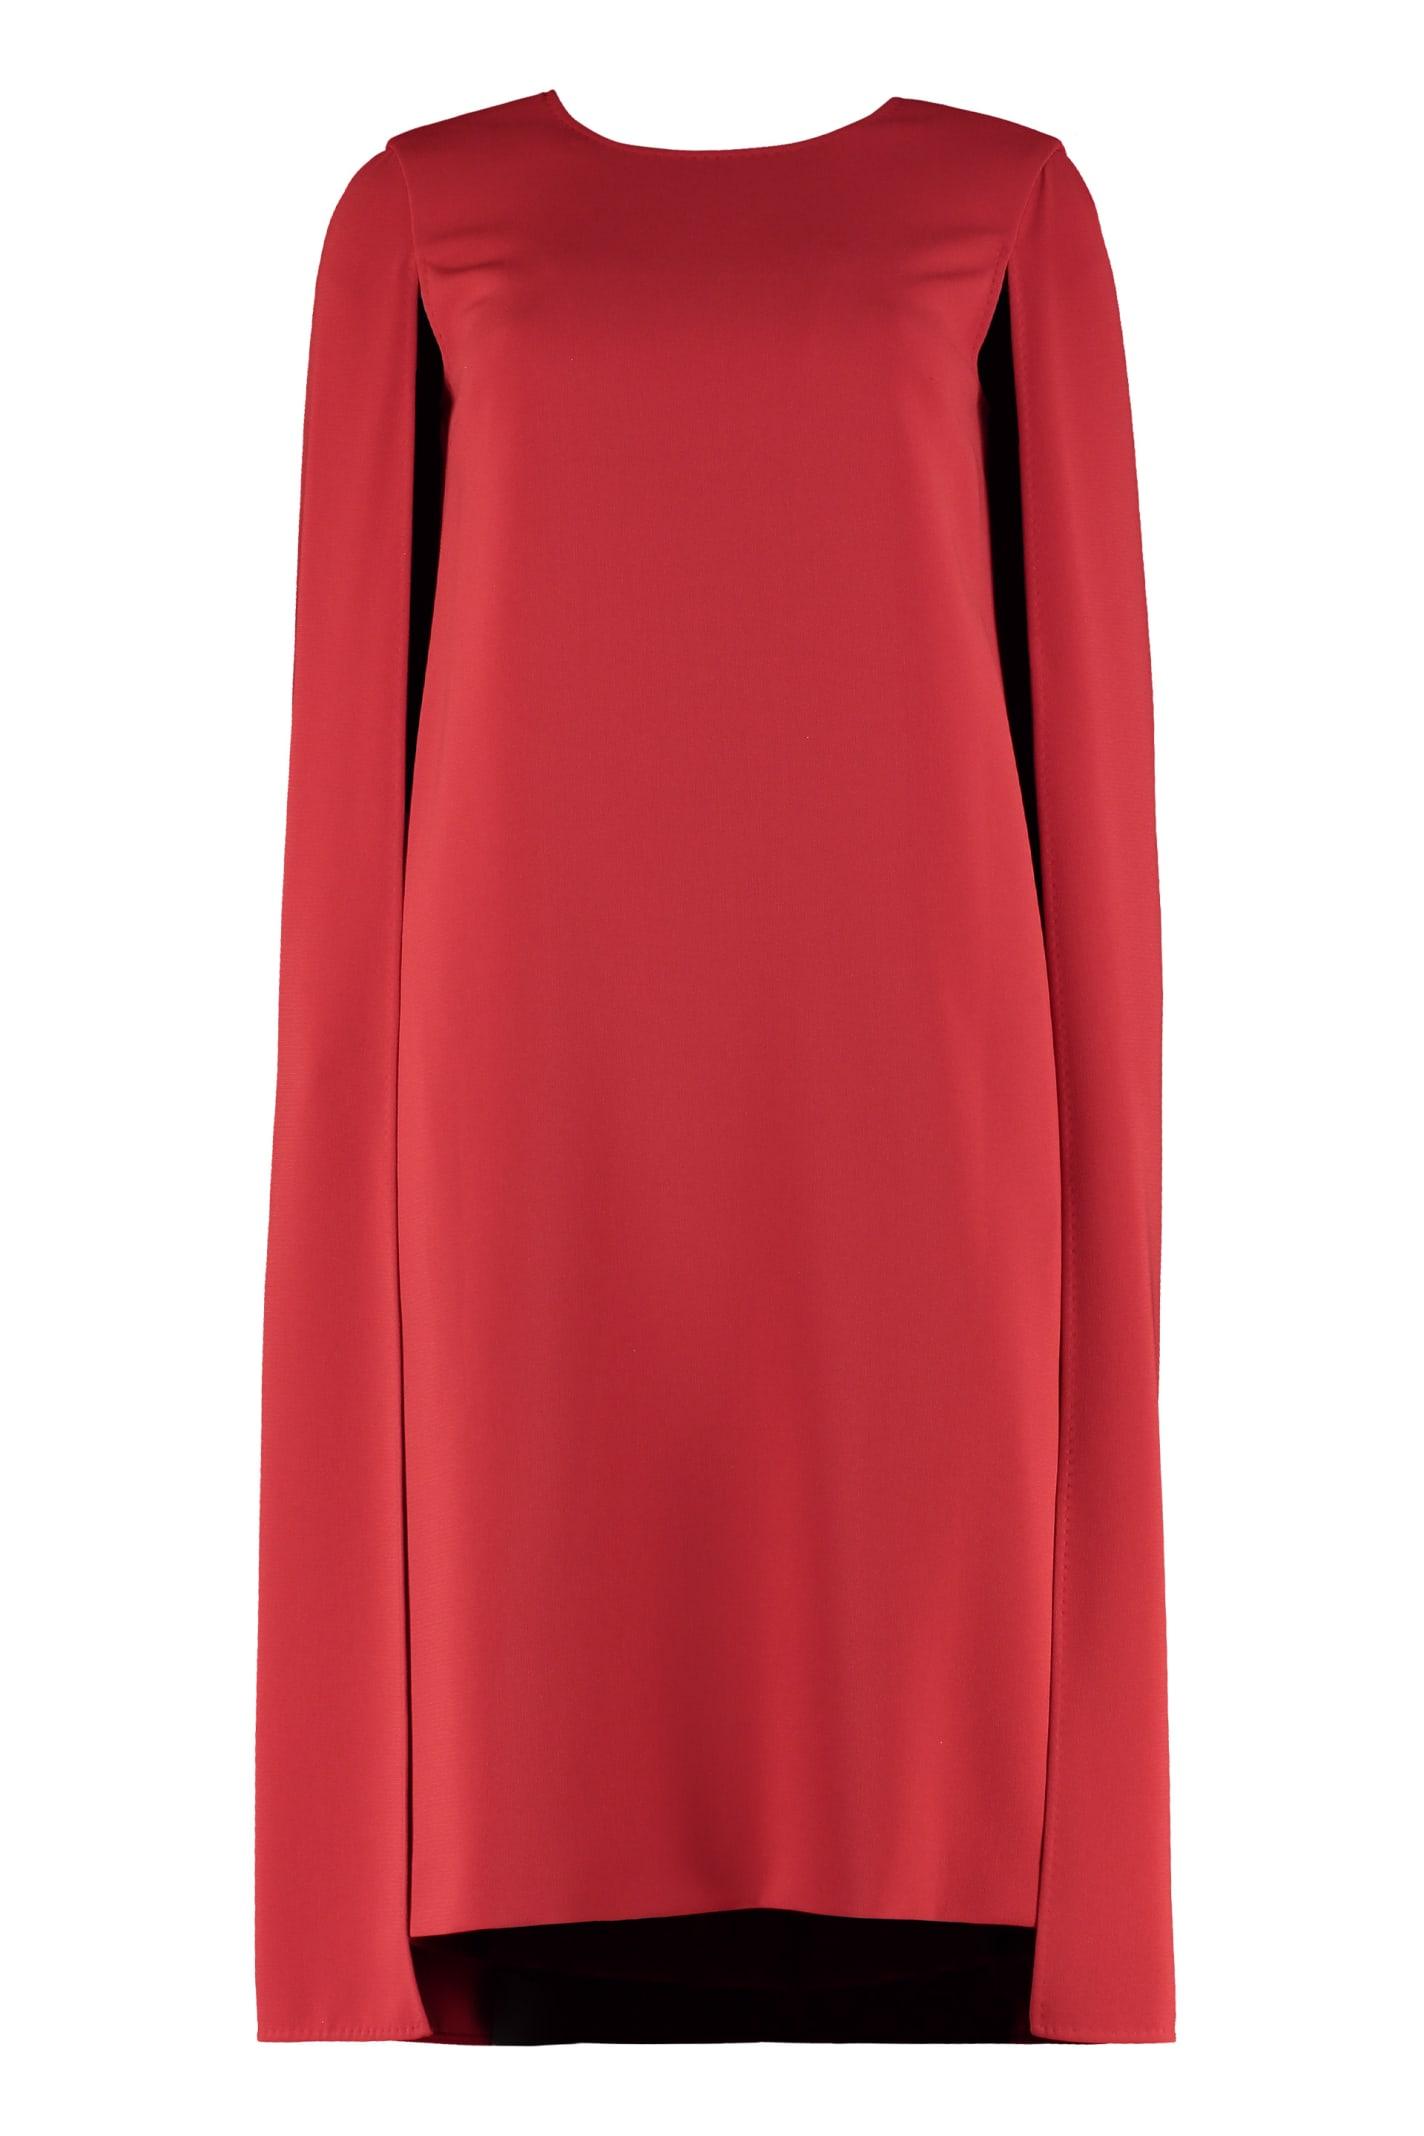 Max Mara Sansone Cape-style Dress